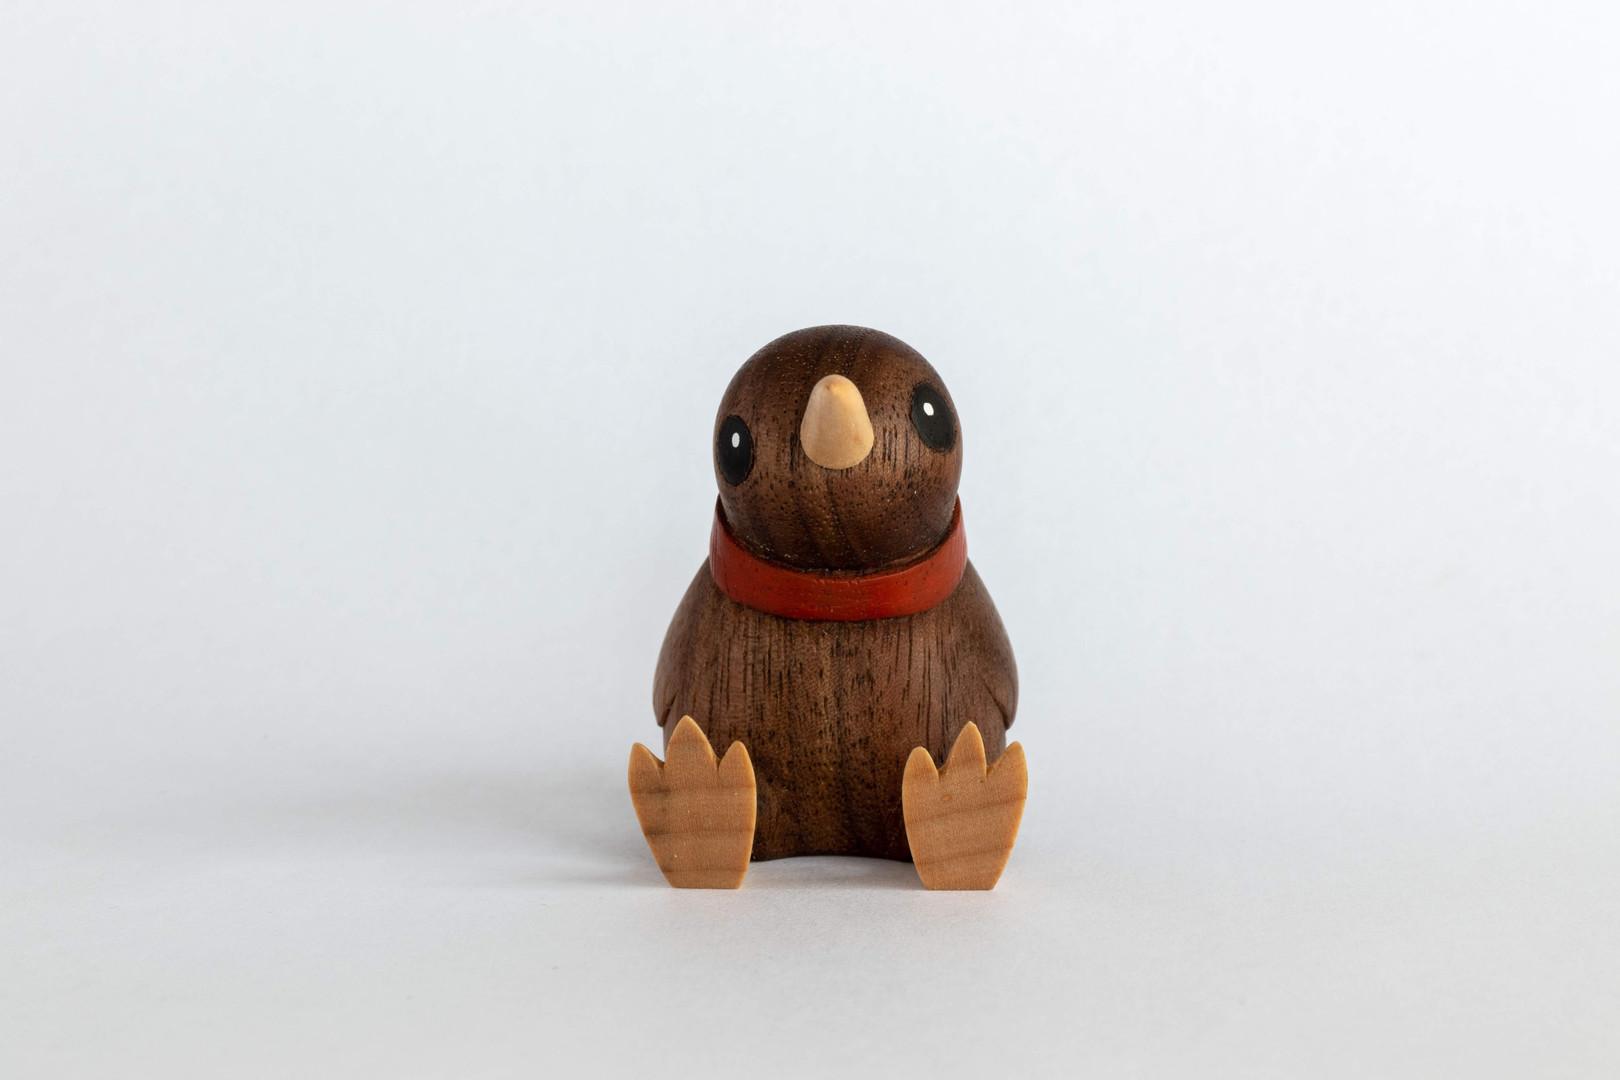 Kiwi wood carving handmade NZ figure in walnut and maple